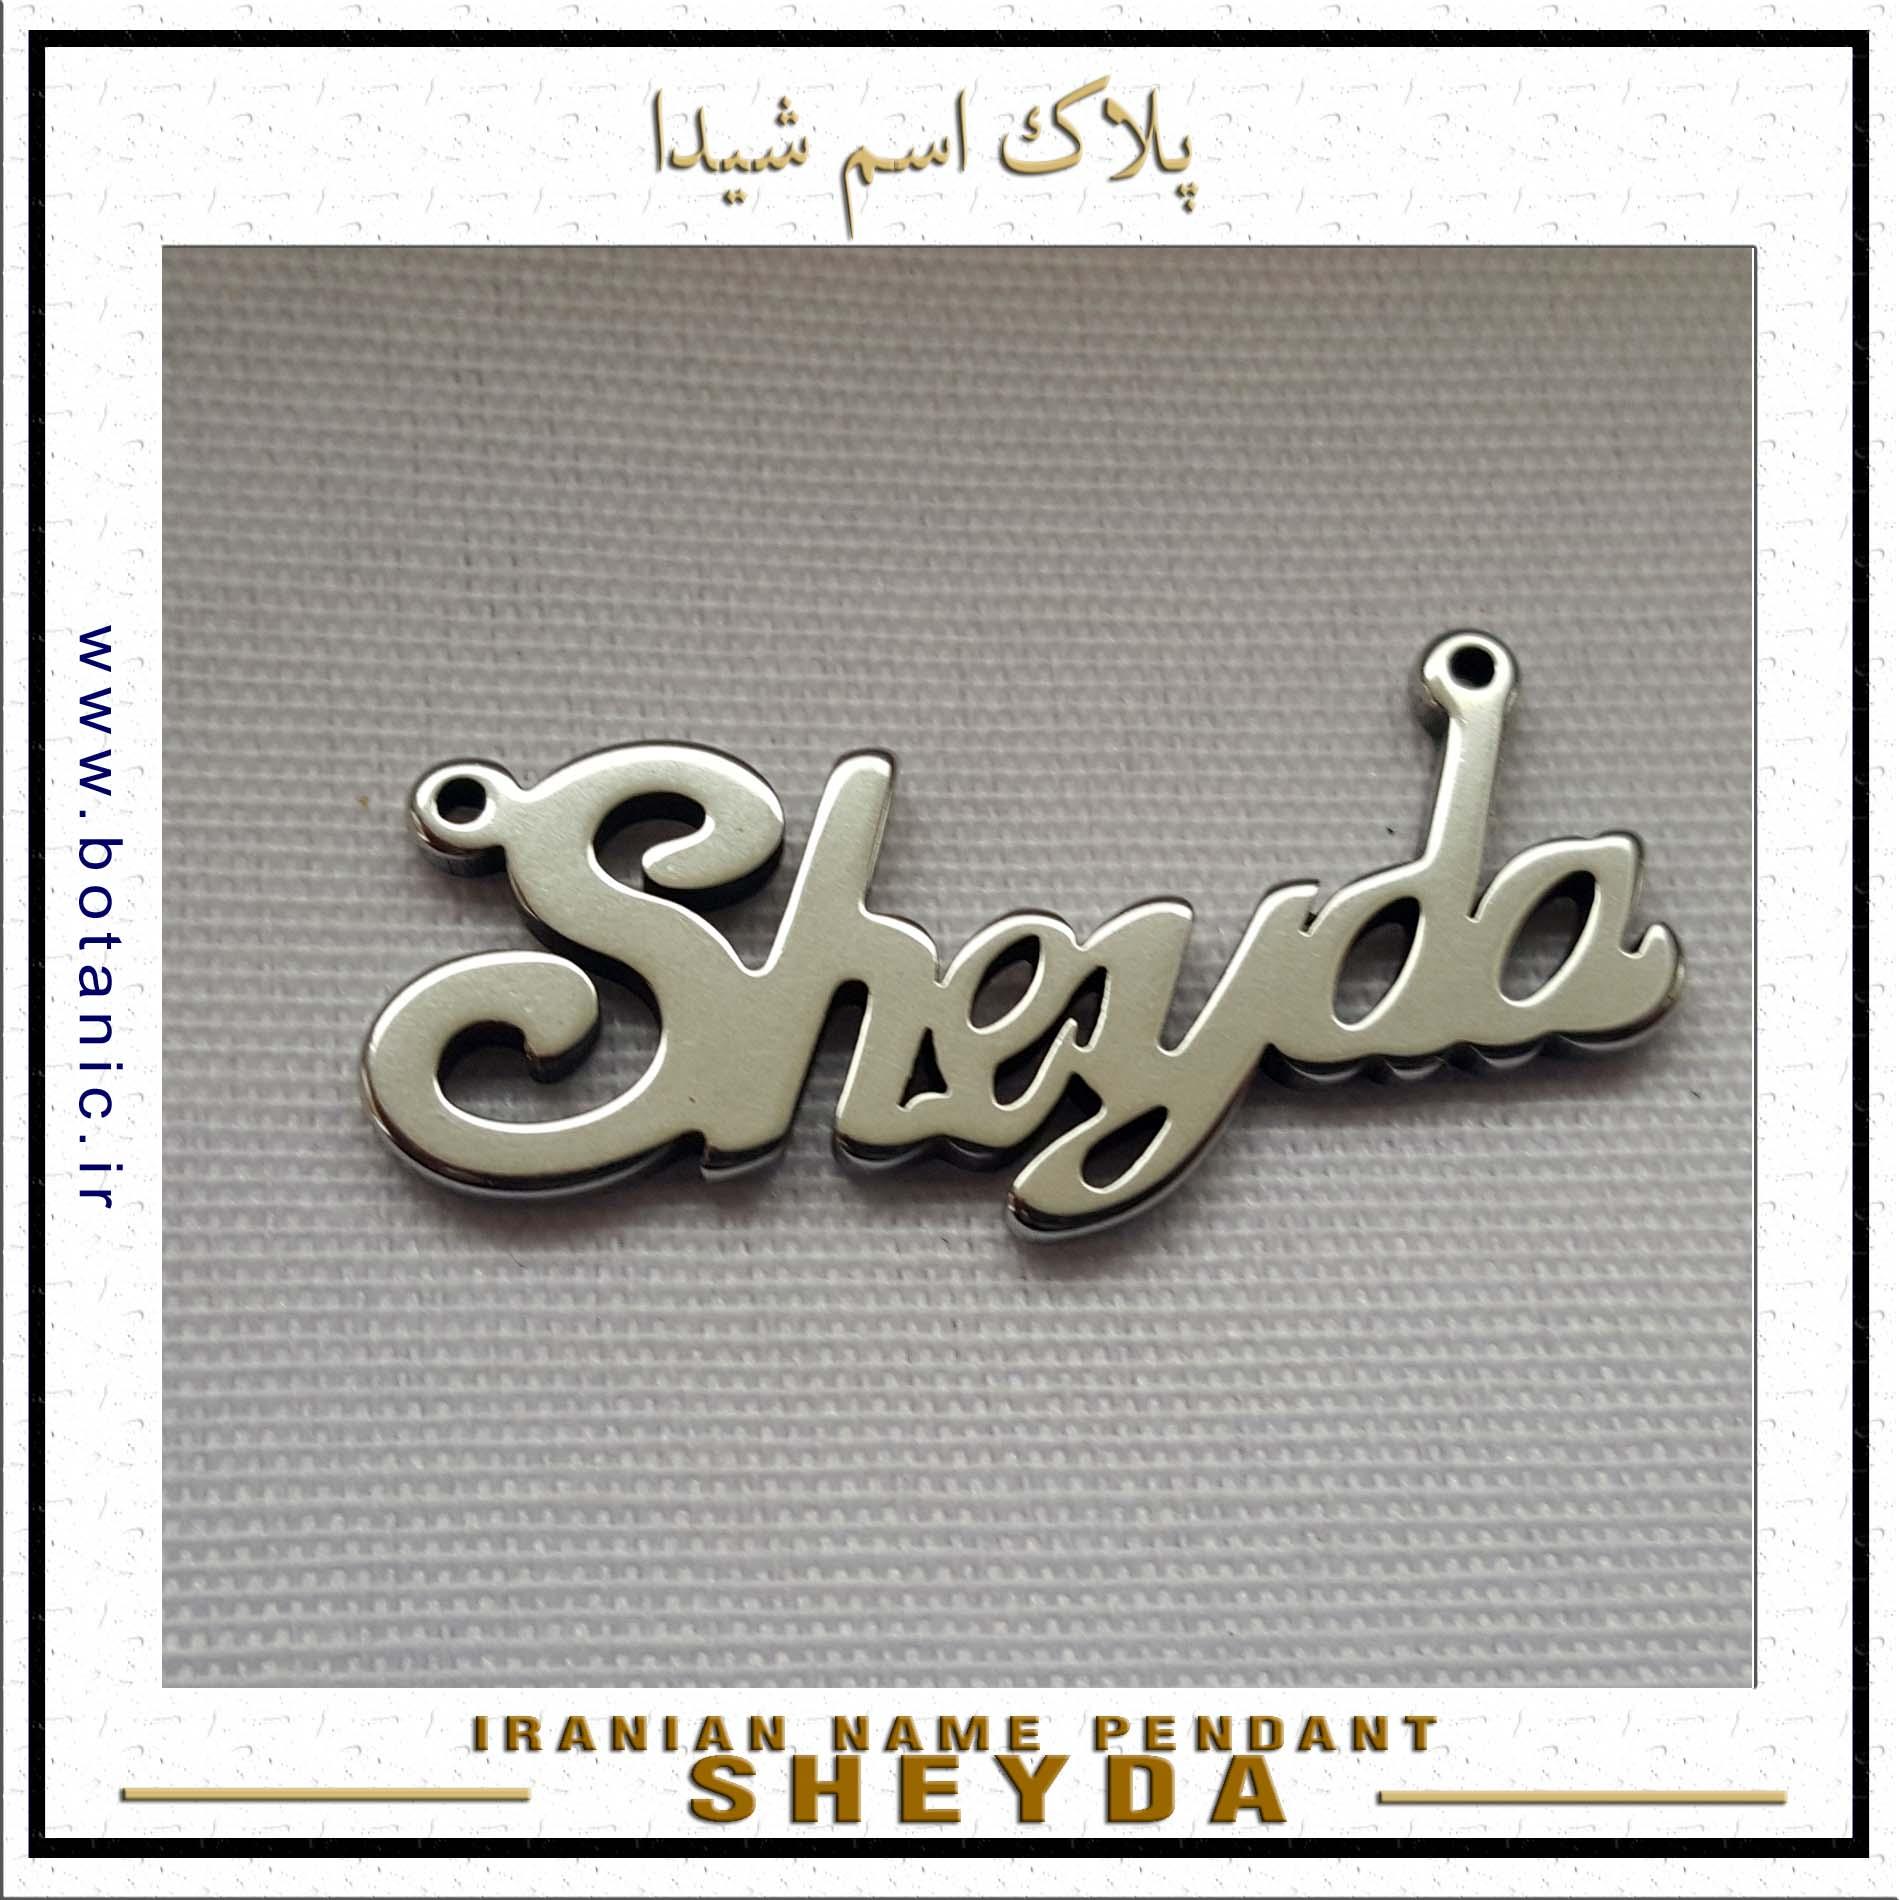 Iranian Name Pendant Sheyda